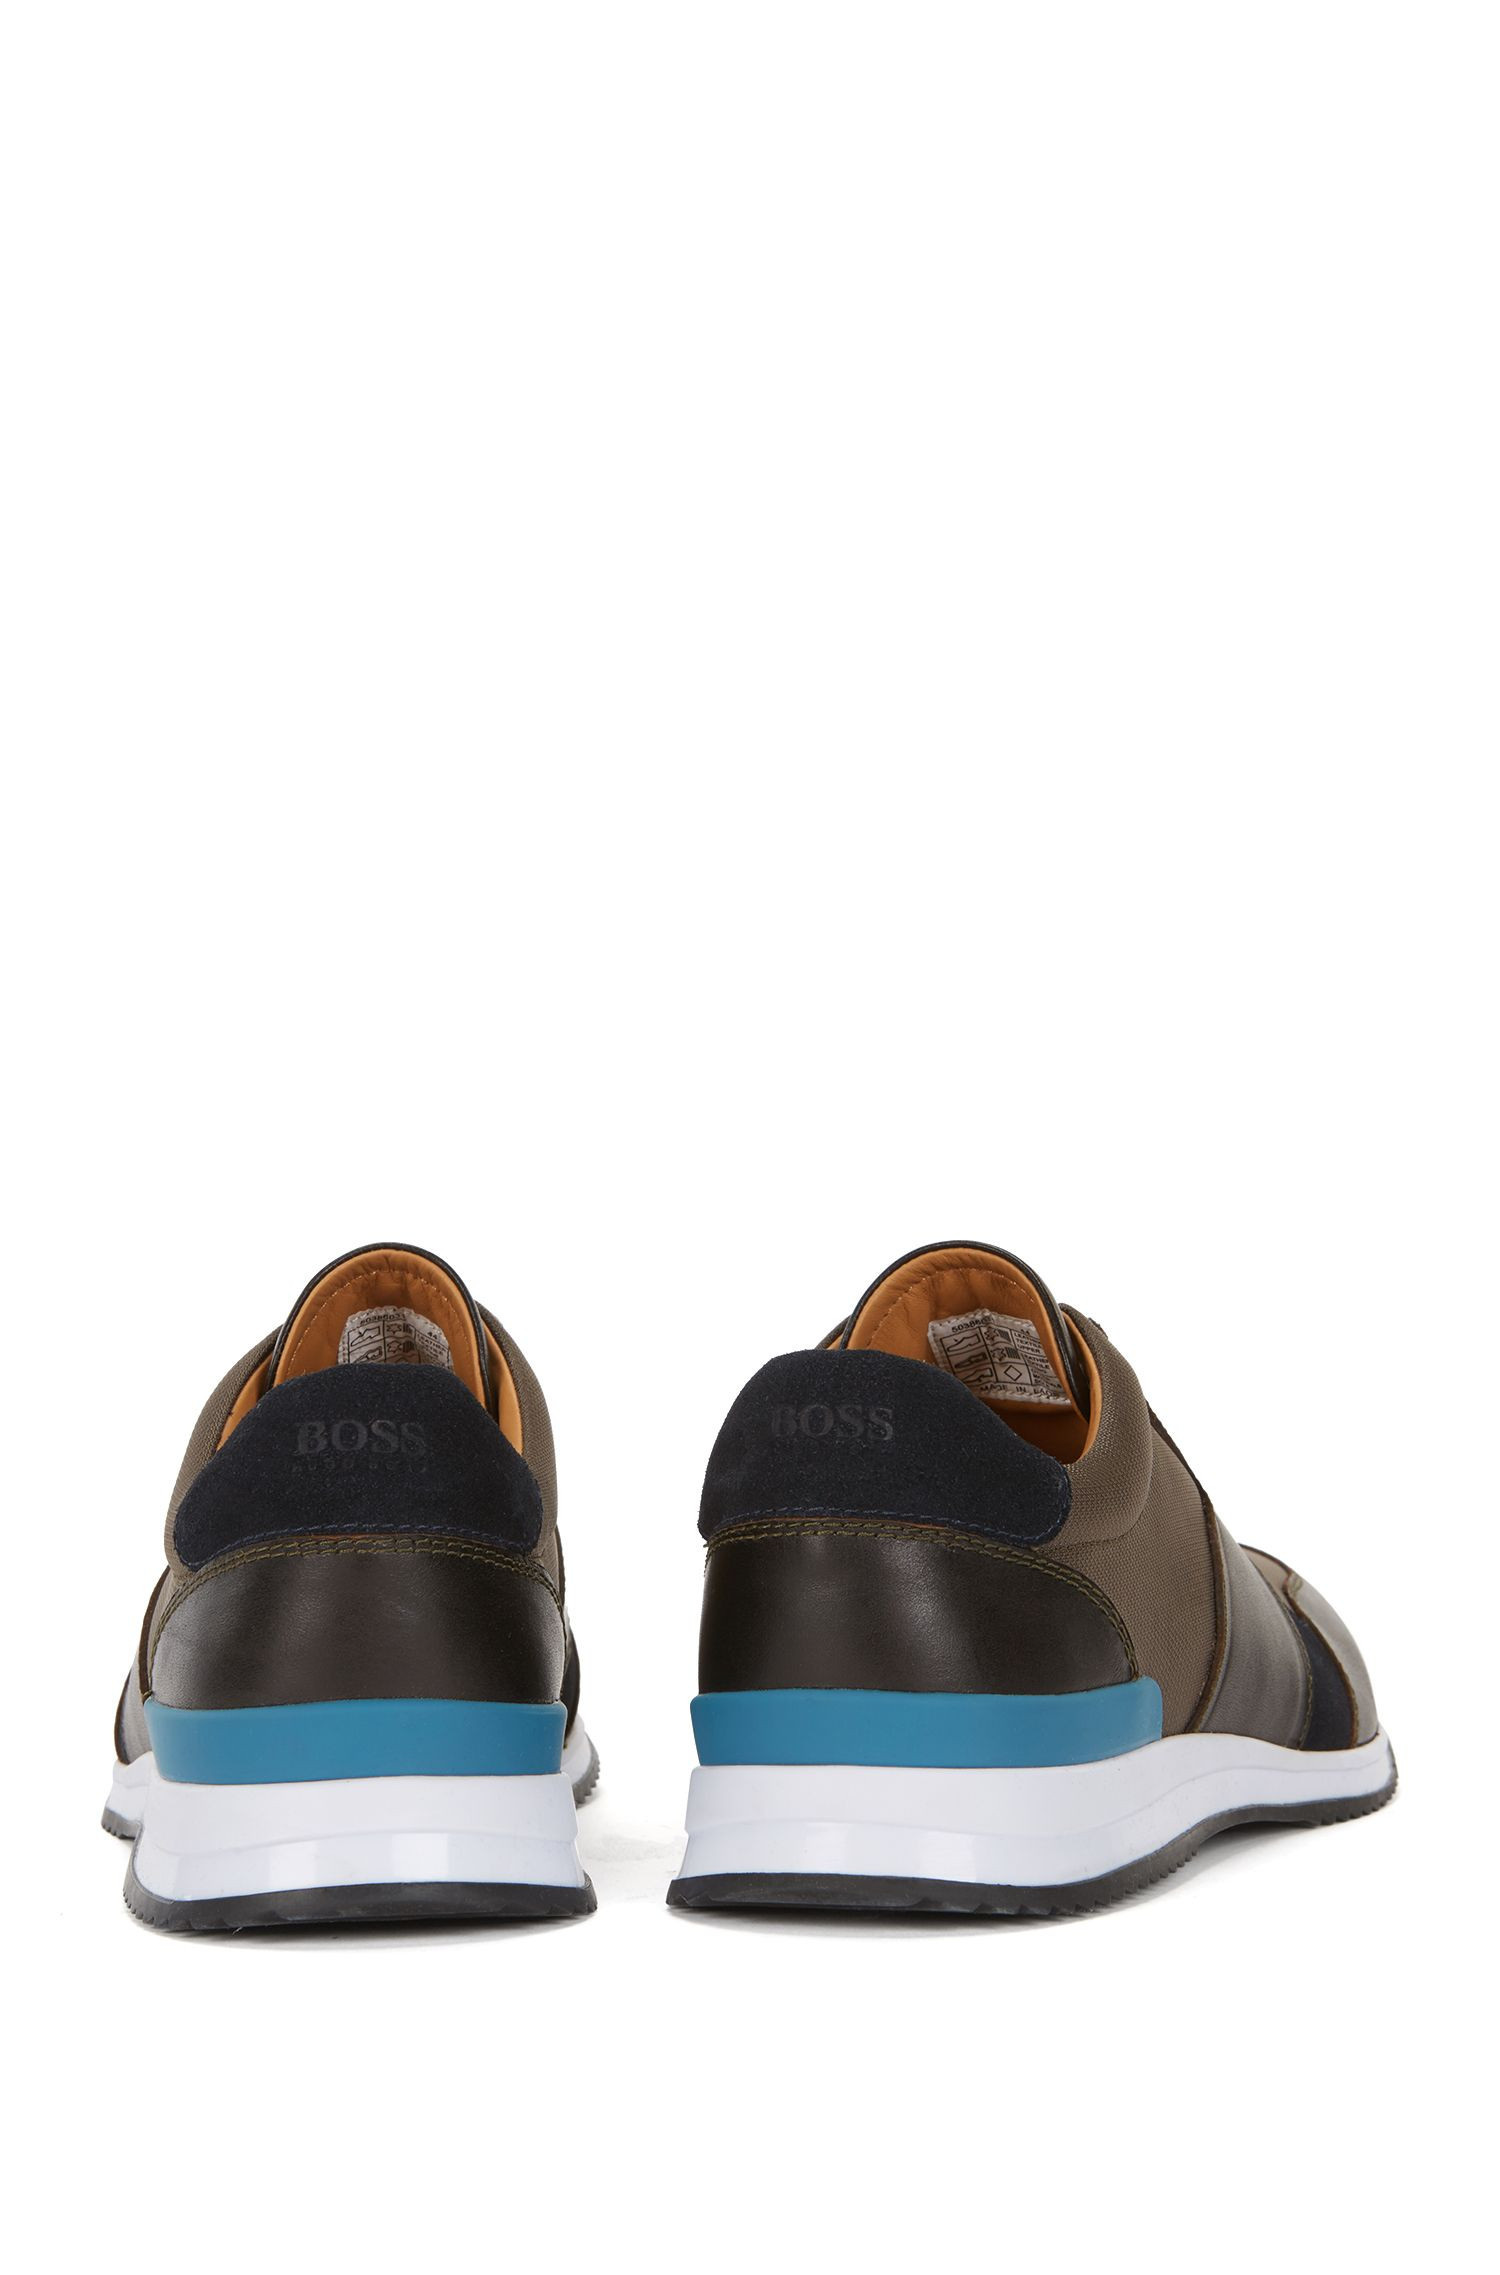 Hardloop-geïnspireerde sneakers met hybride bovenzijde